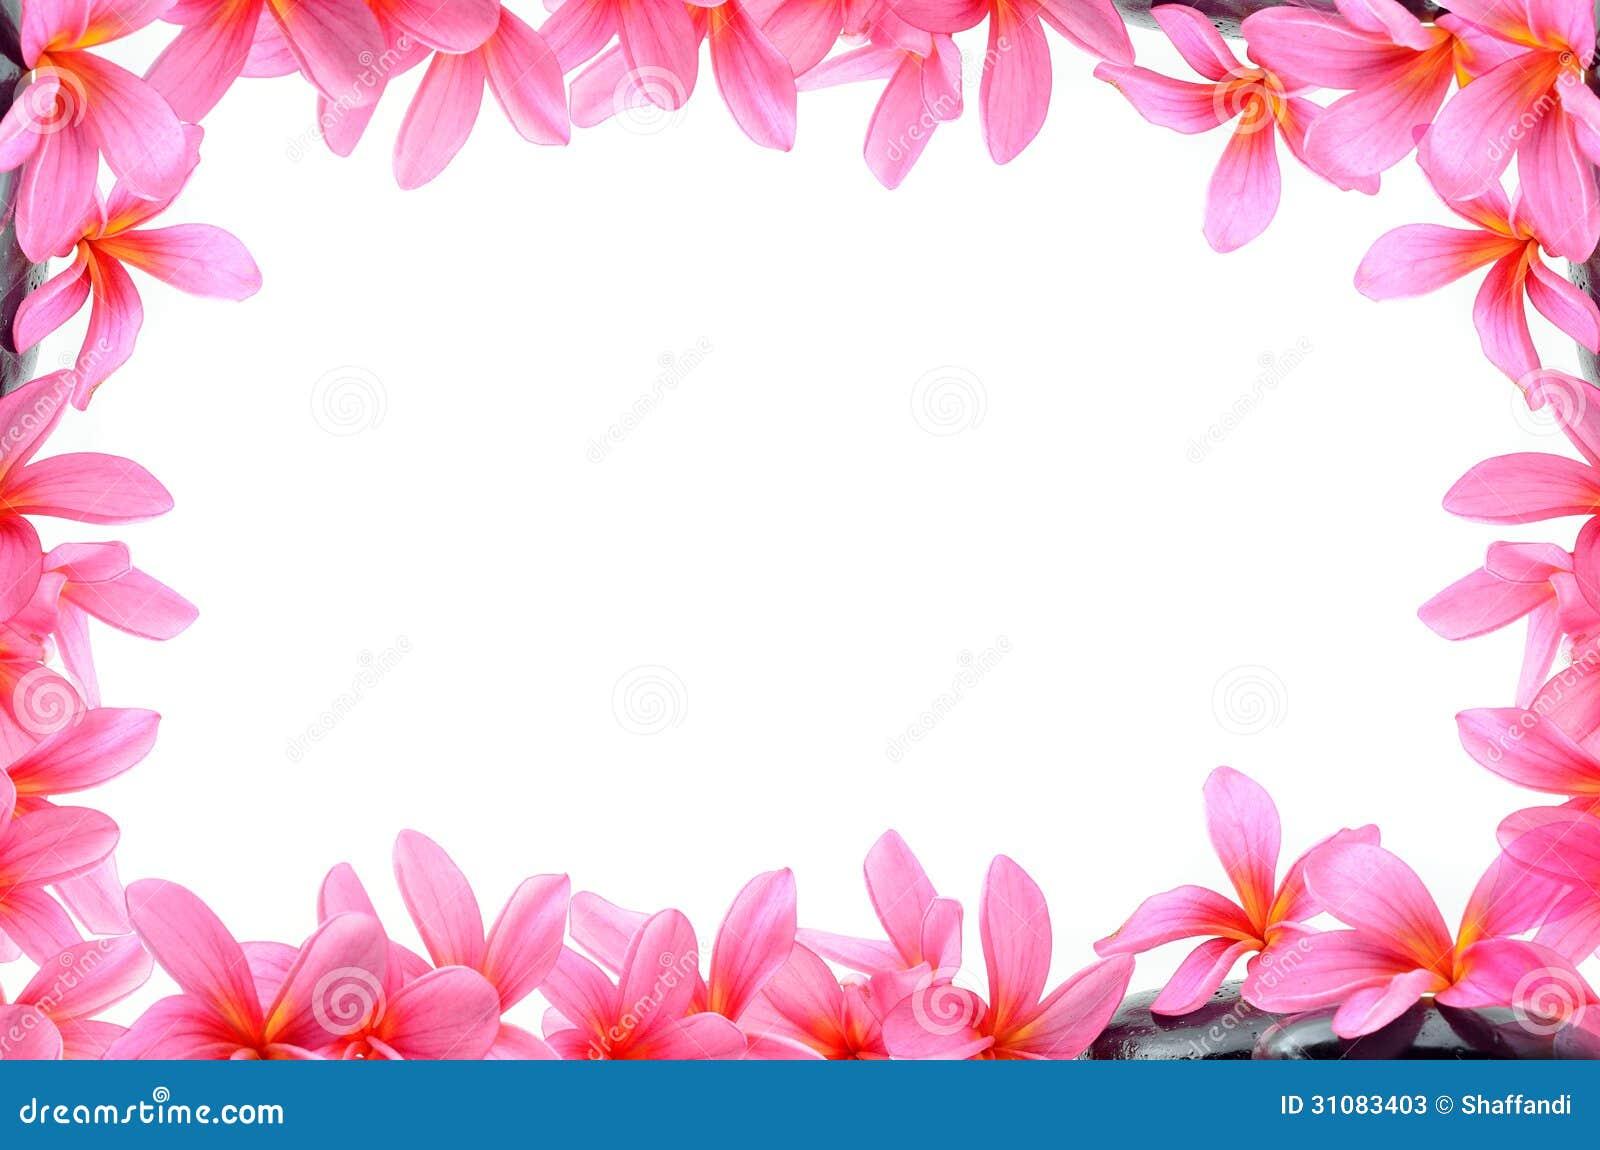 95+ Hawaiian Flowers Border - Beautiful Frangipani Flowers ...